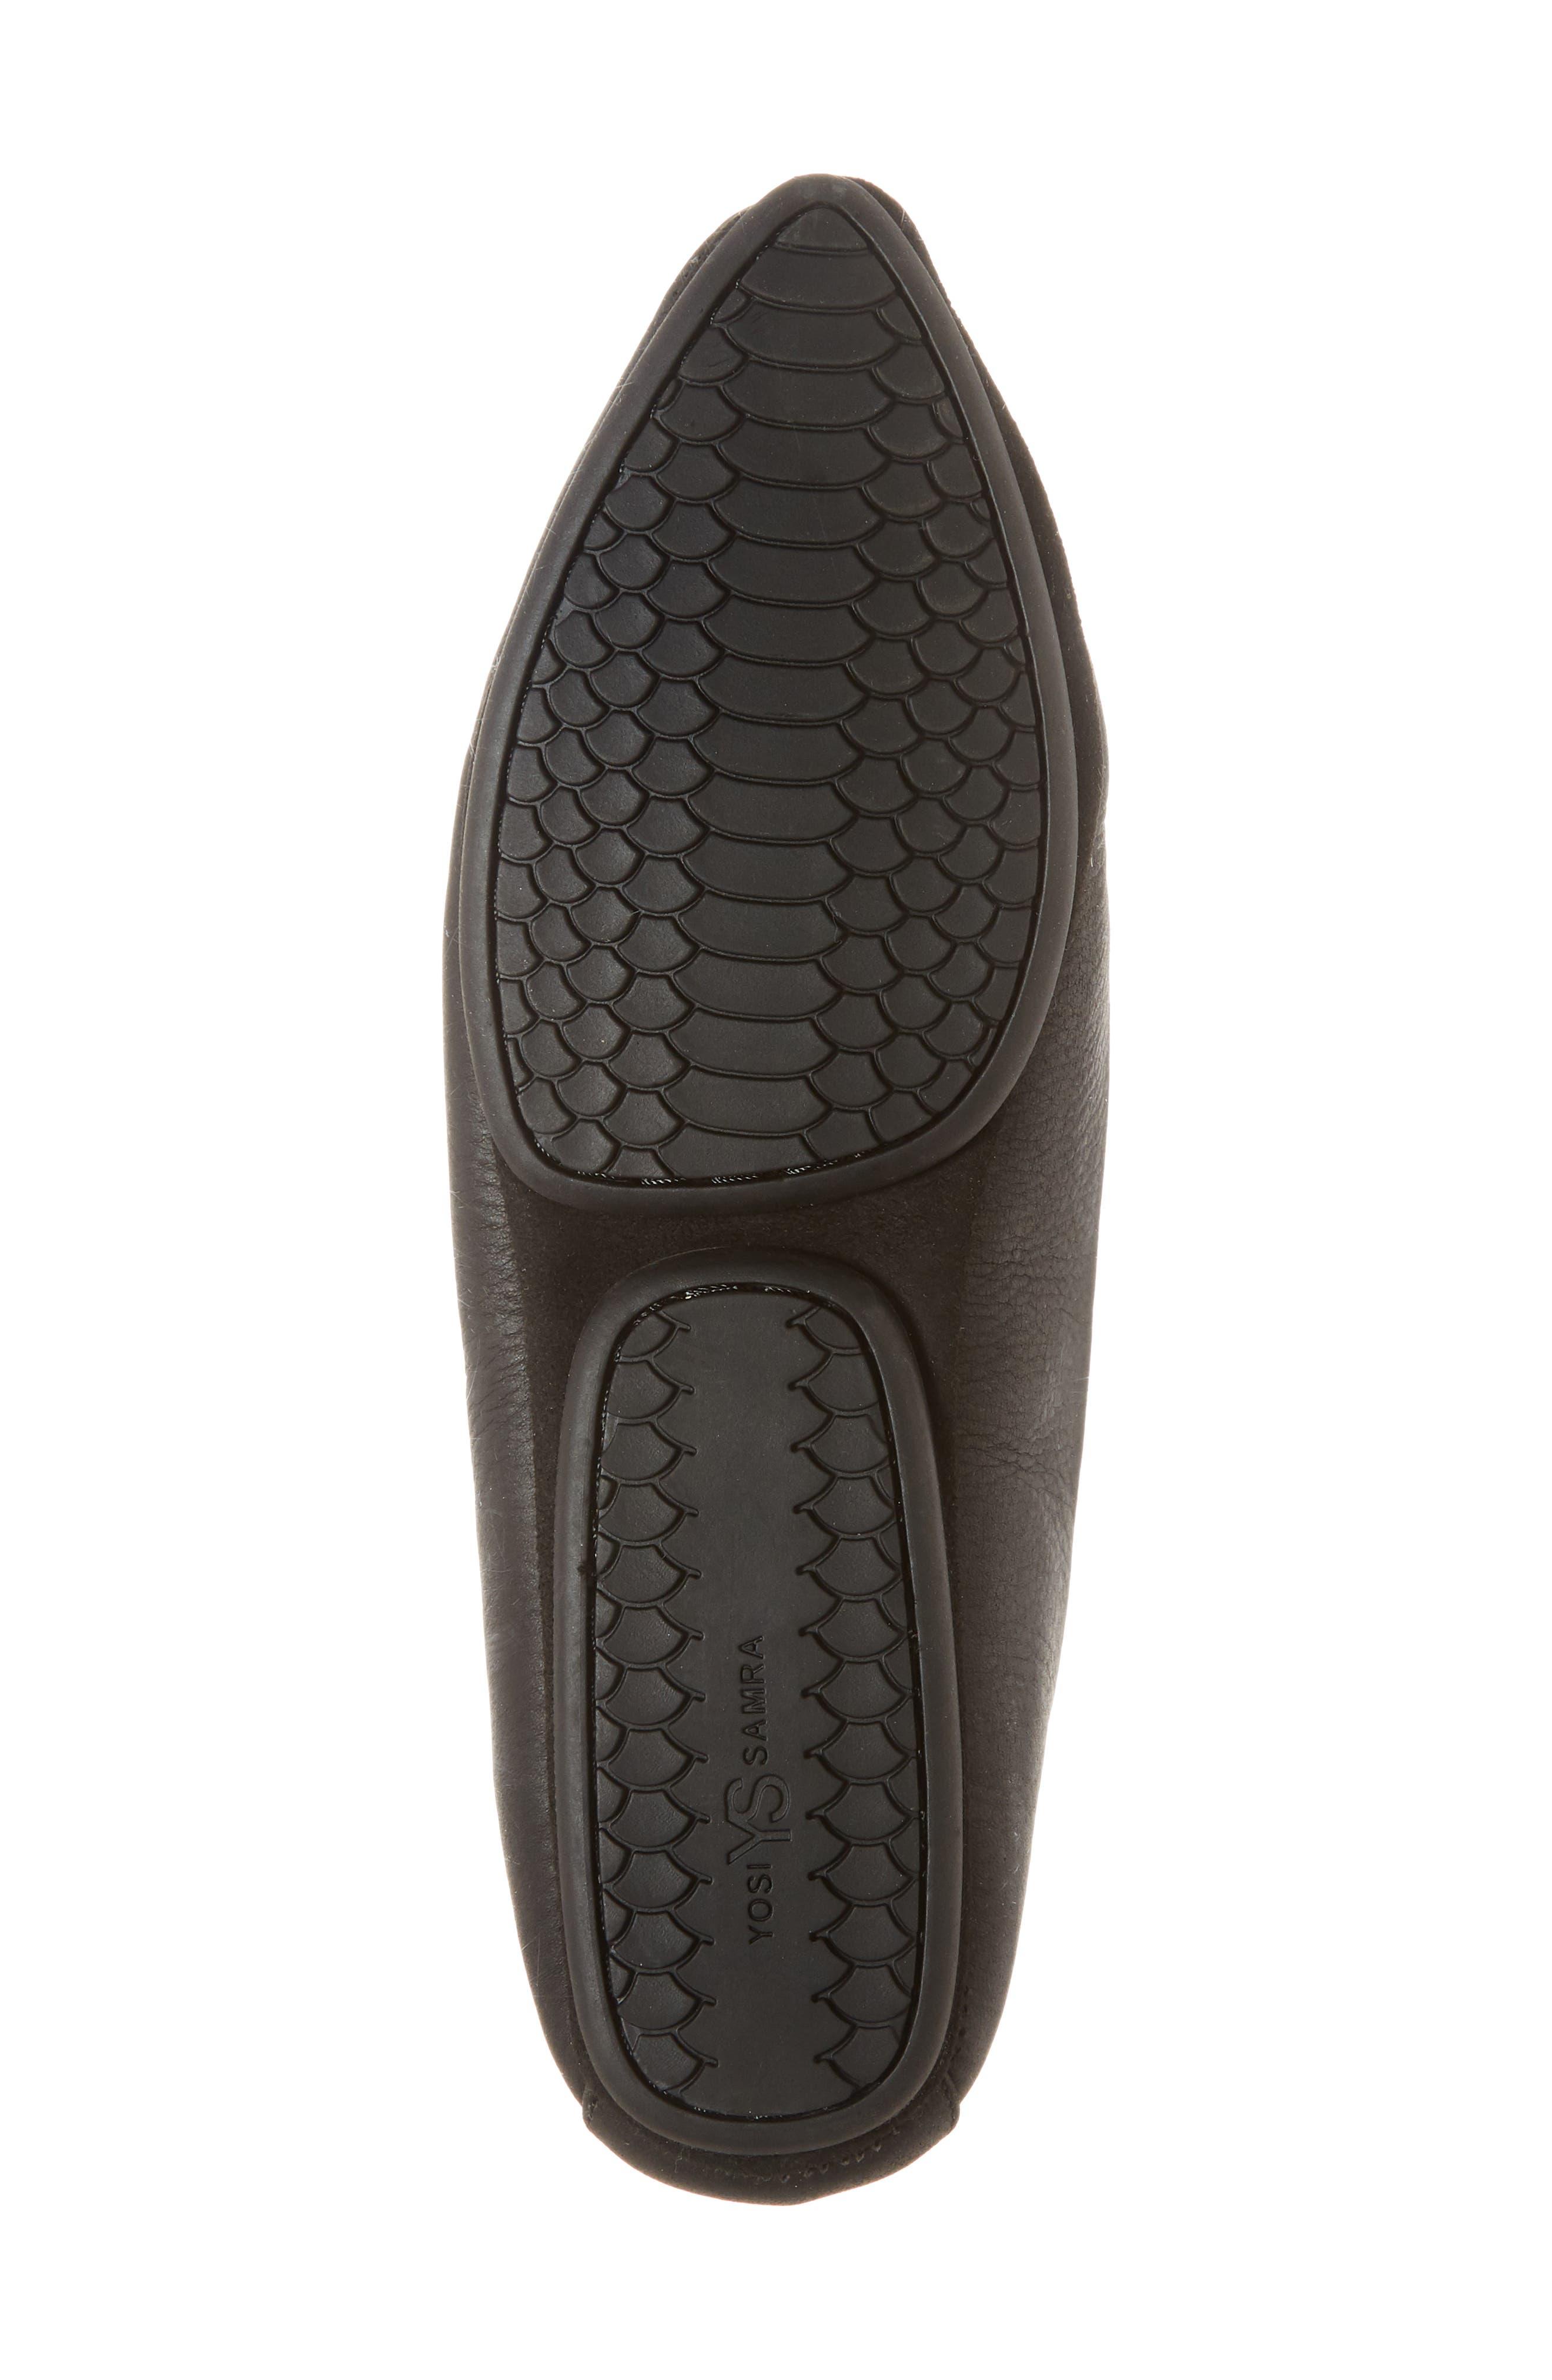 Vera Loafer,                             Alternate thumbnail 6, color,                             Black Stud Leather